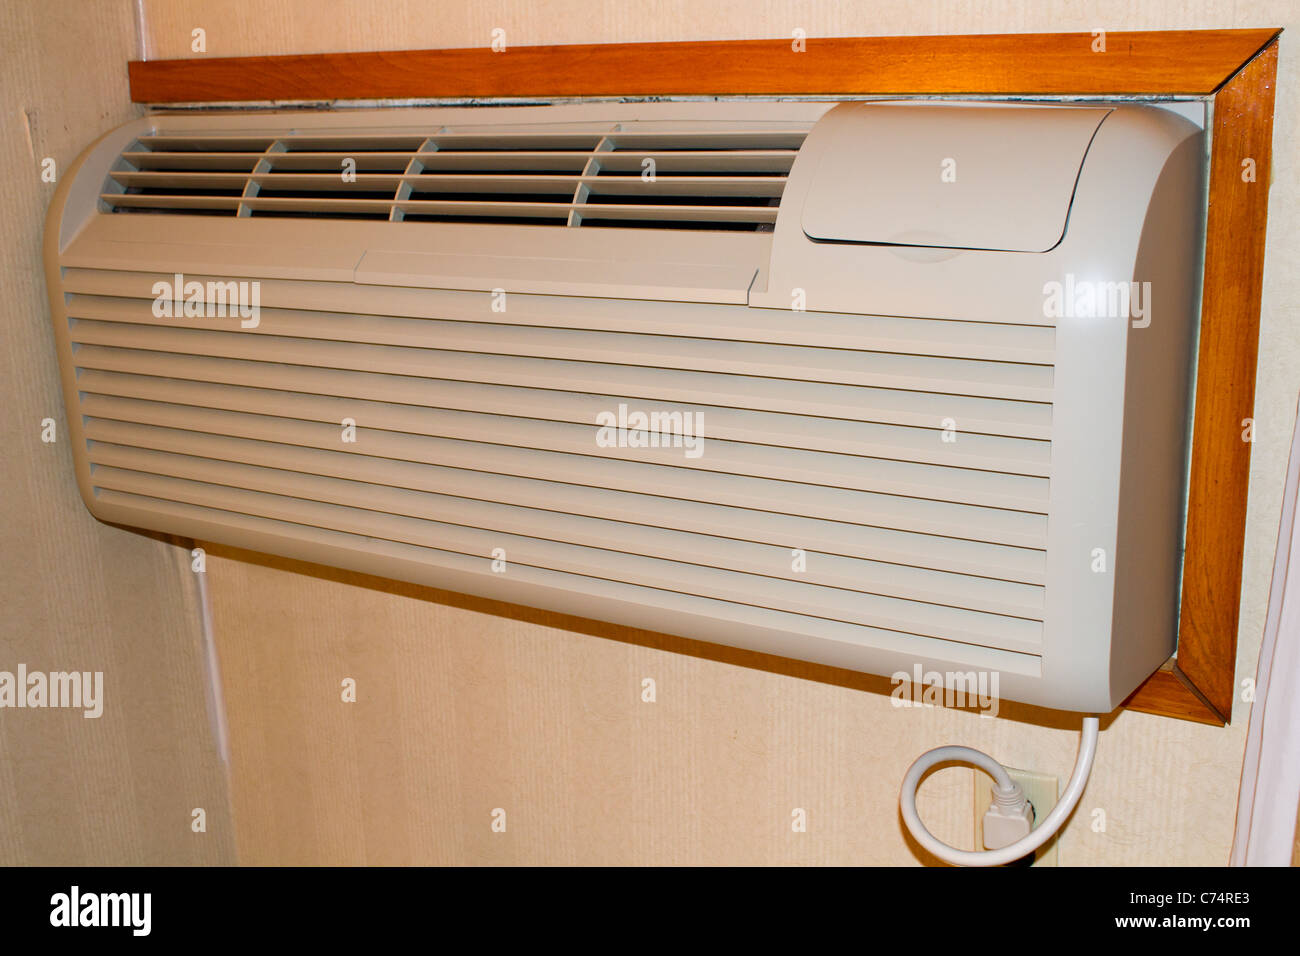 air conditioner stock photos air conditioner stock. Black Bedroom Furniture Sets. Home Design Ideas